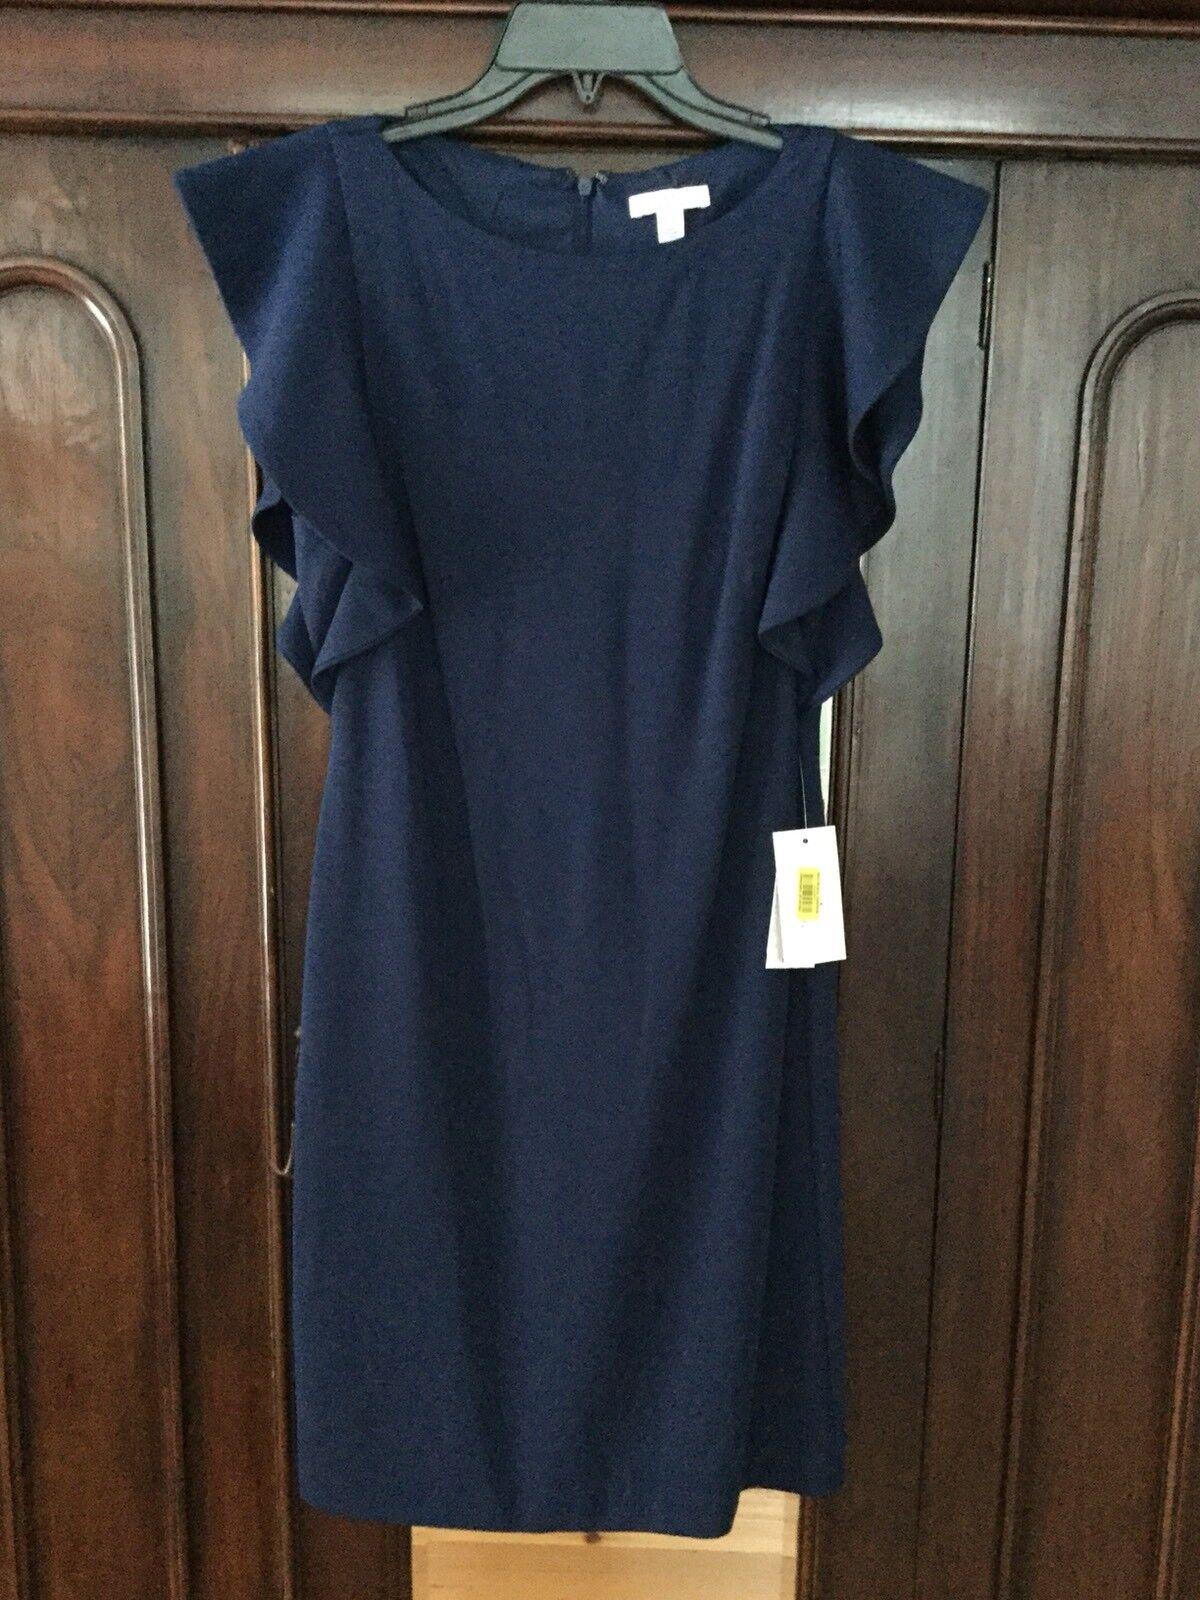 NWT Halston Sheath Dress With Flutter Sleeve, Navy, Navy, Navy, Size 6 55889a